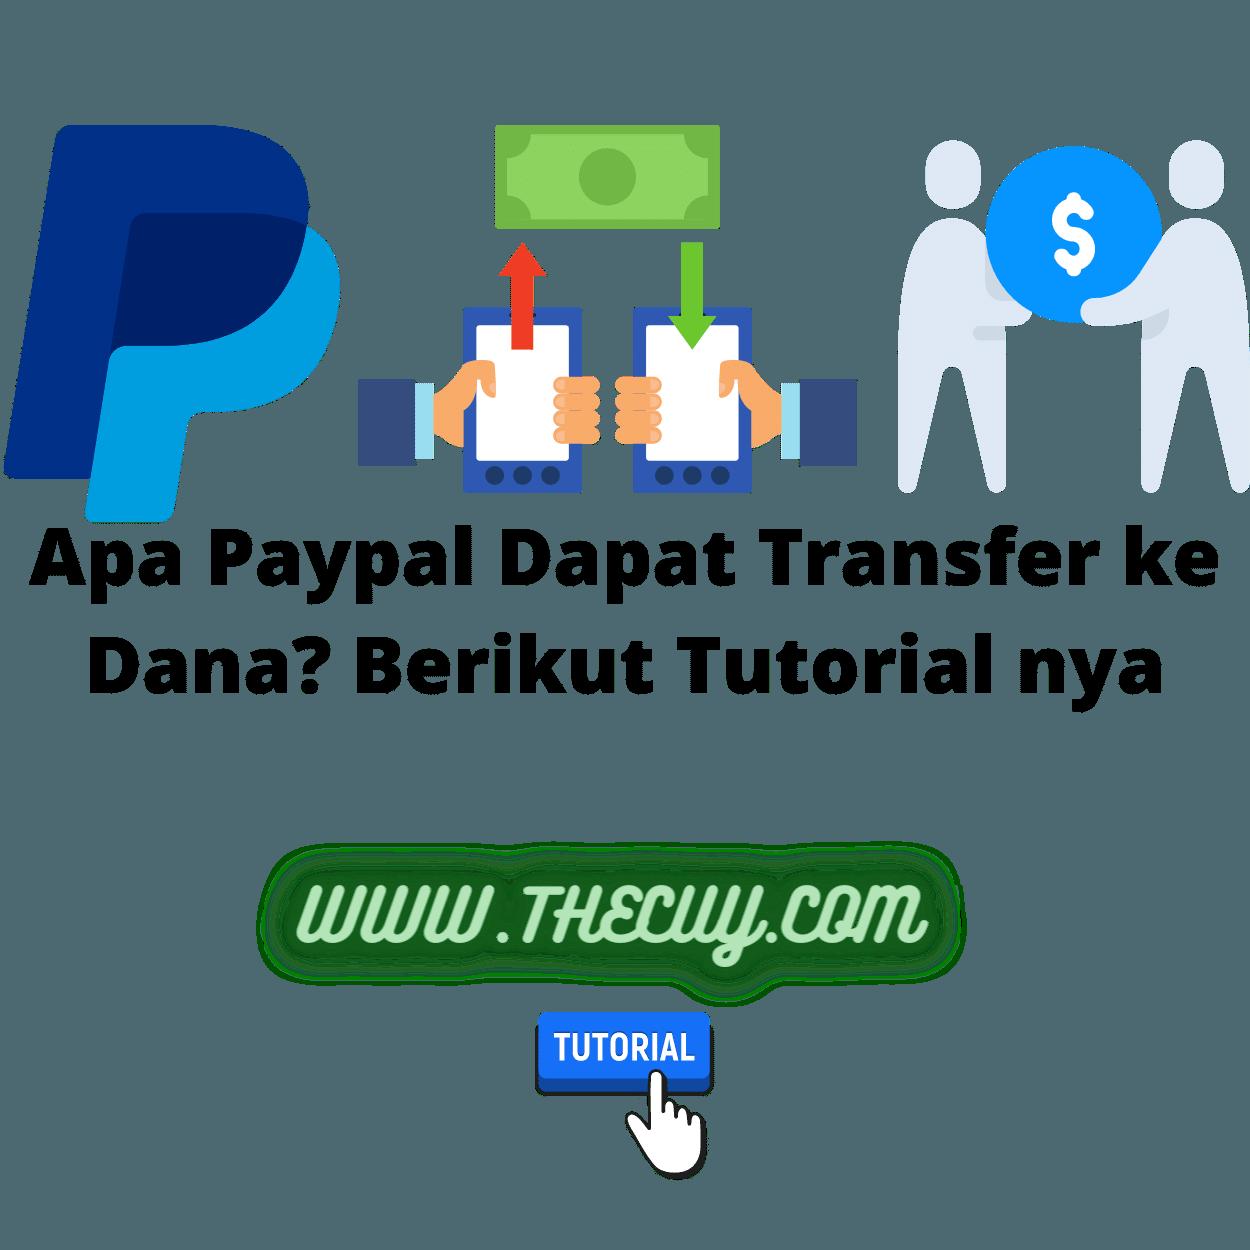 Apa Paypal Dapat Transfer ke Dana? Berikut Tutorial nya